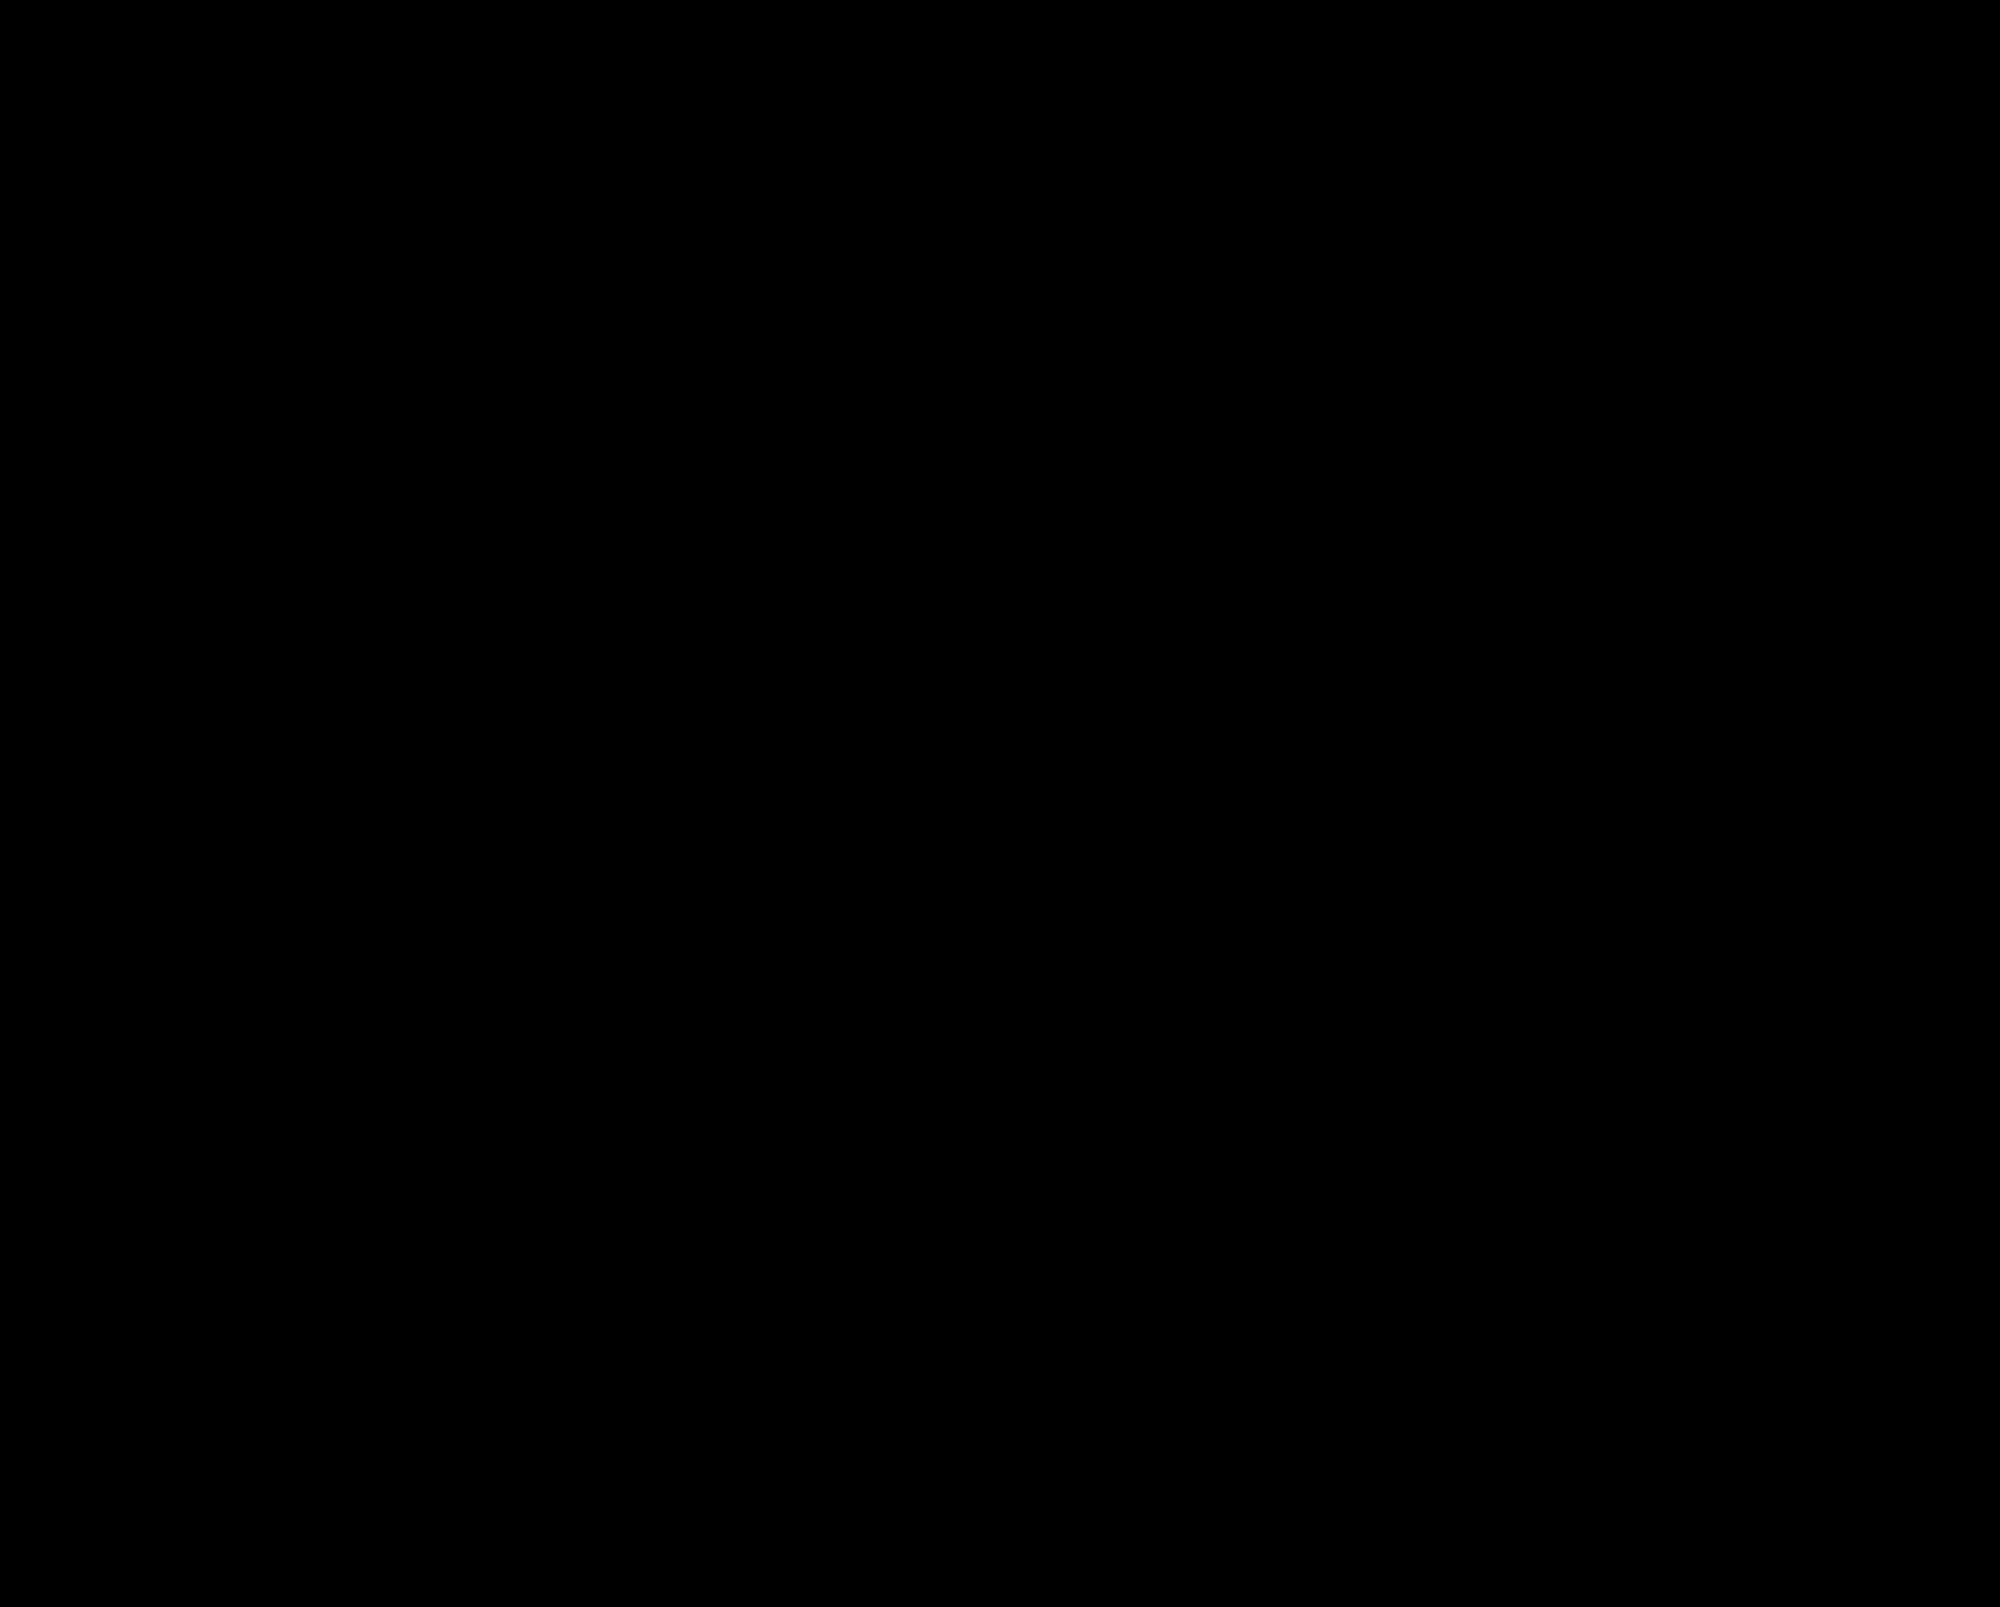 D F P-logo-black.png